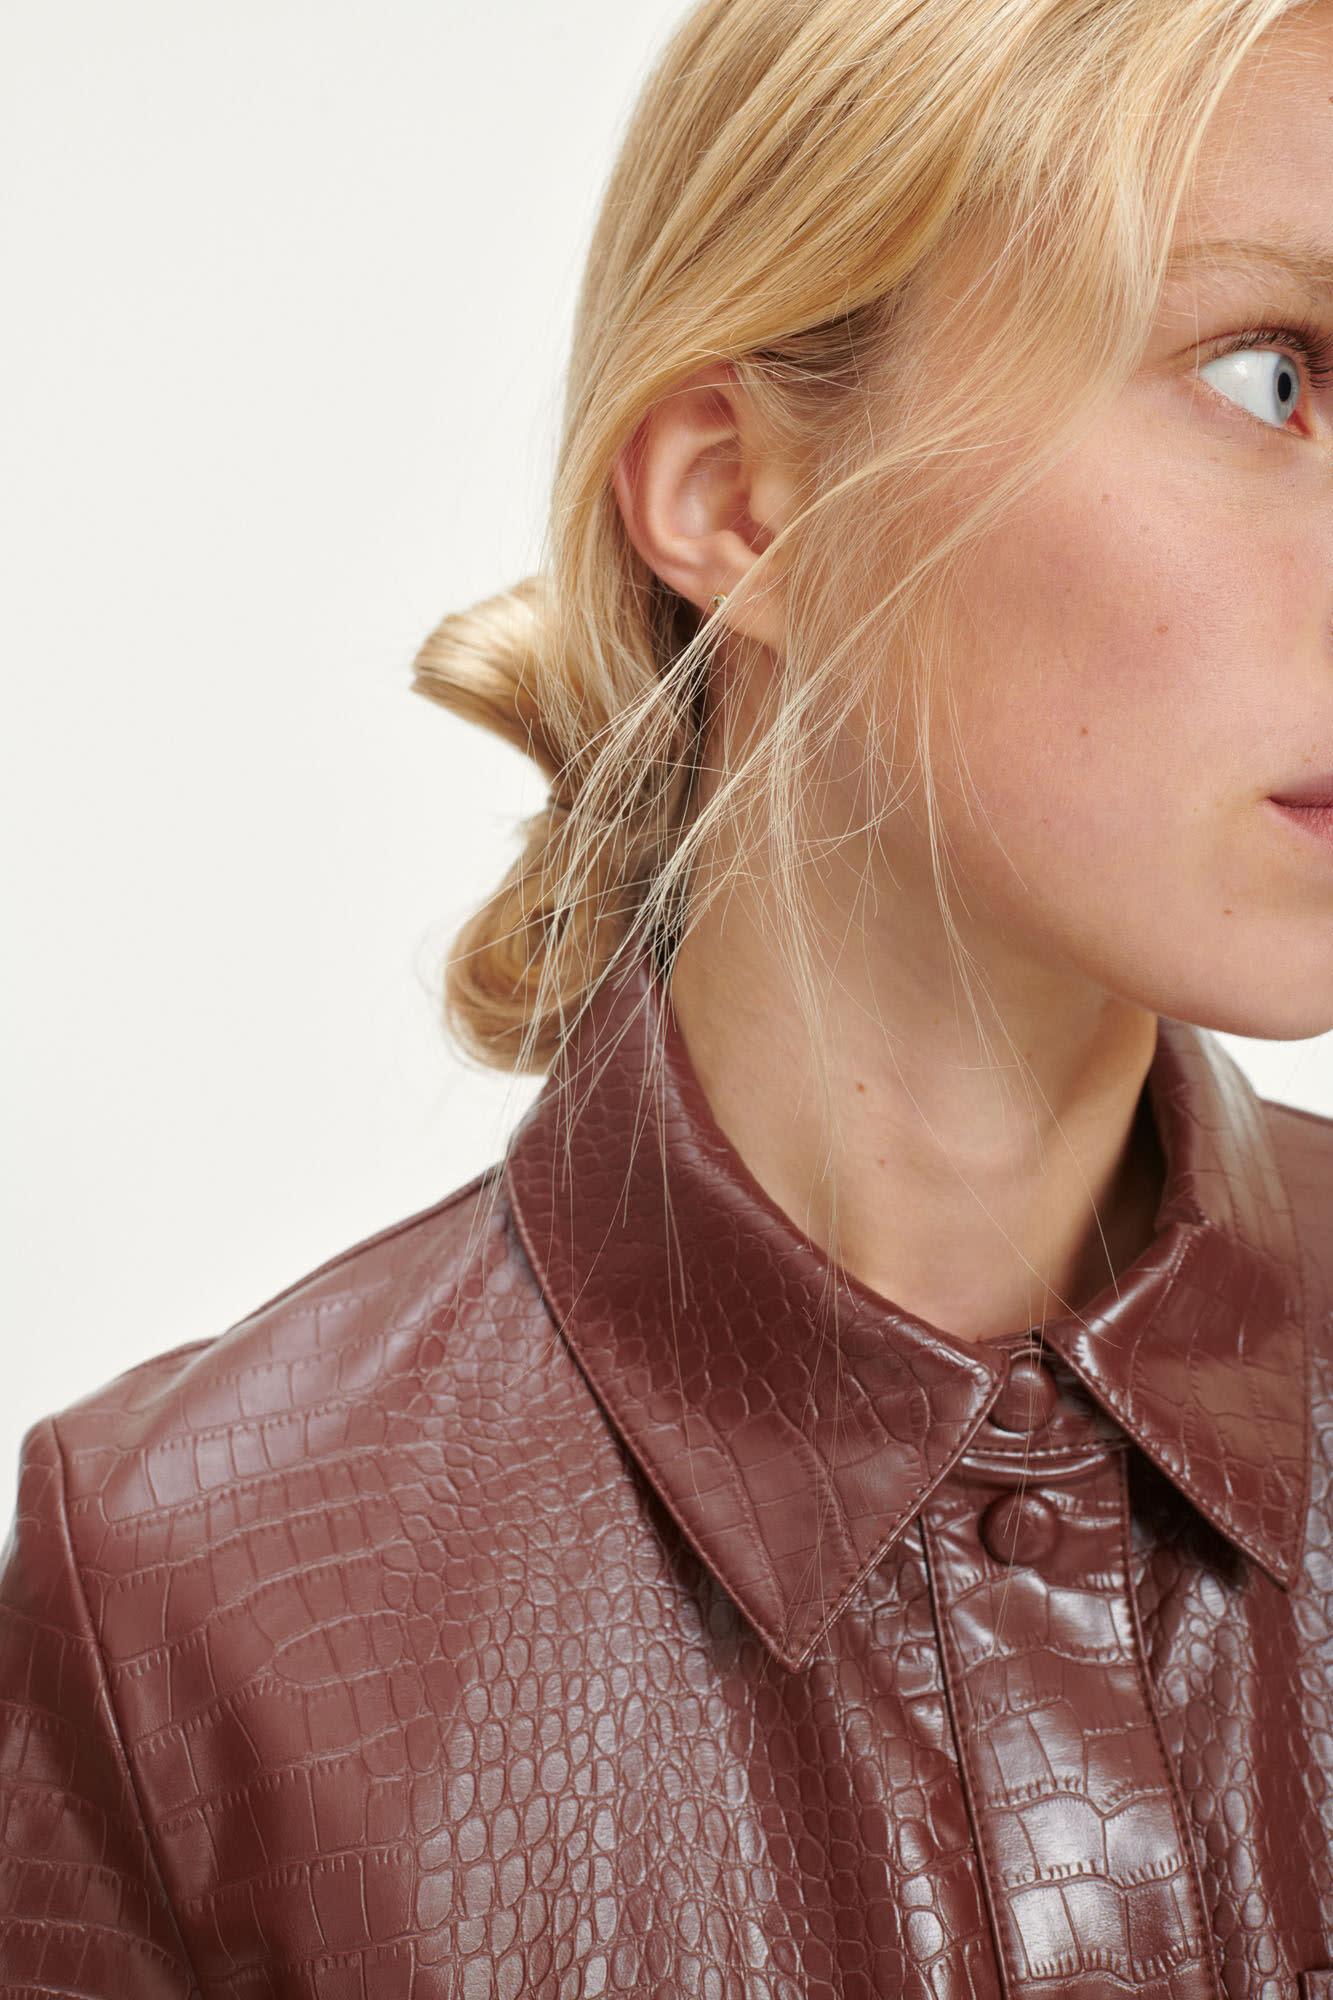 Myla Faux Leather Dress Chocolate Brown-3